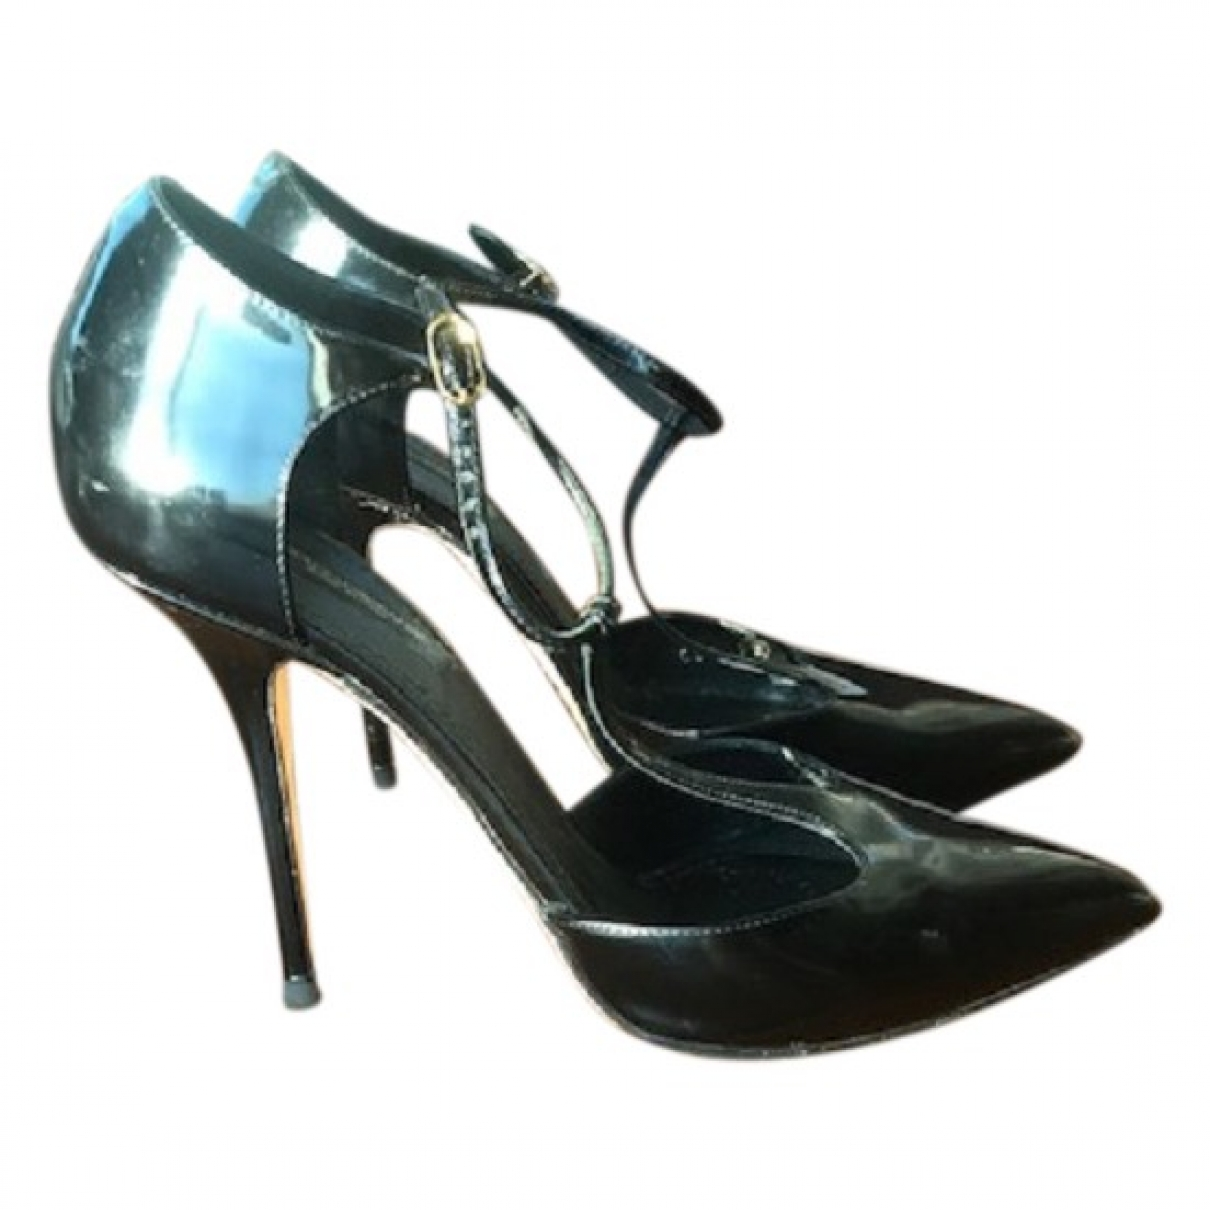 Dolce & Gabbana \N Black Leather Heels for Women 39 EU